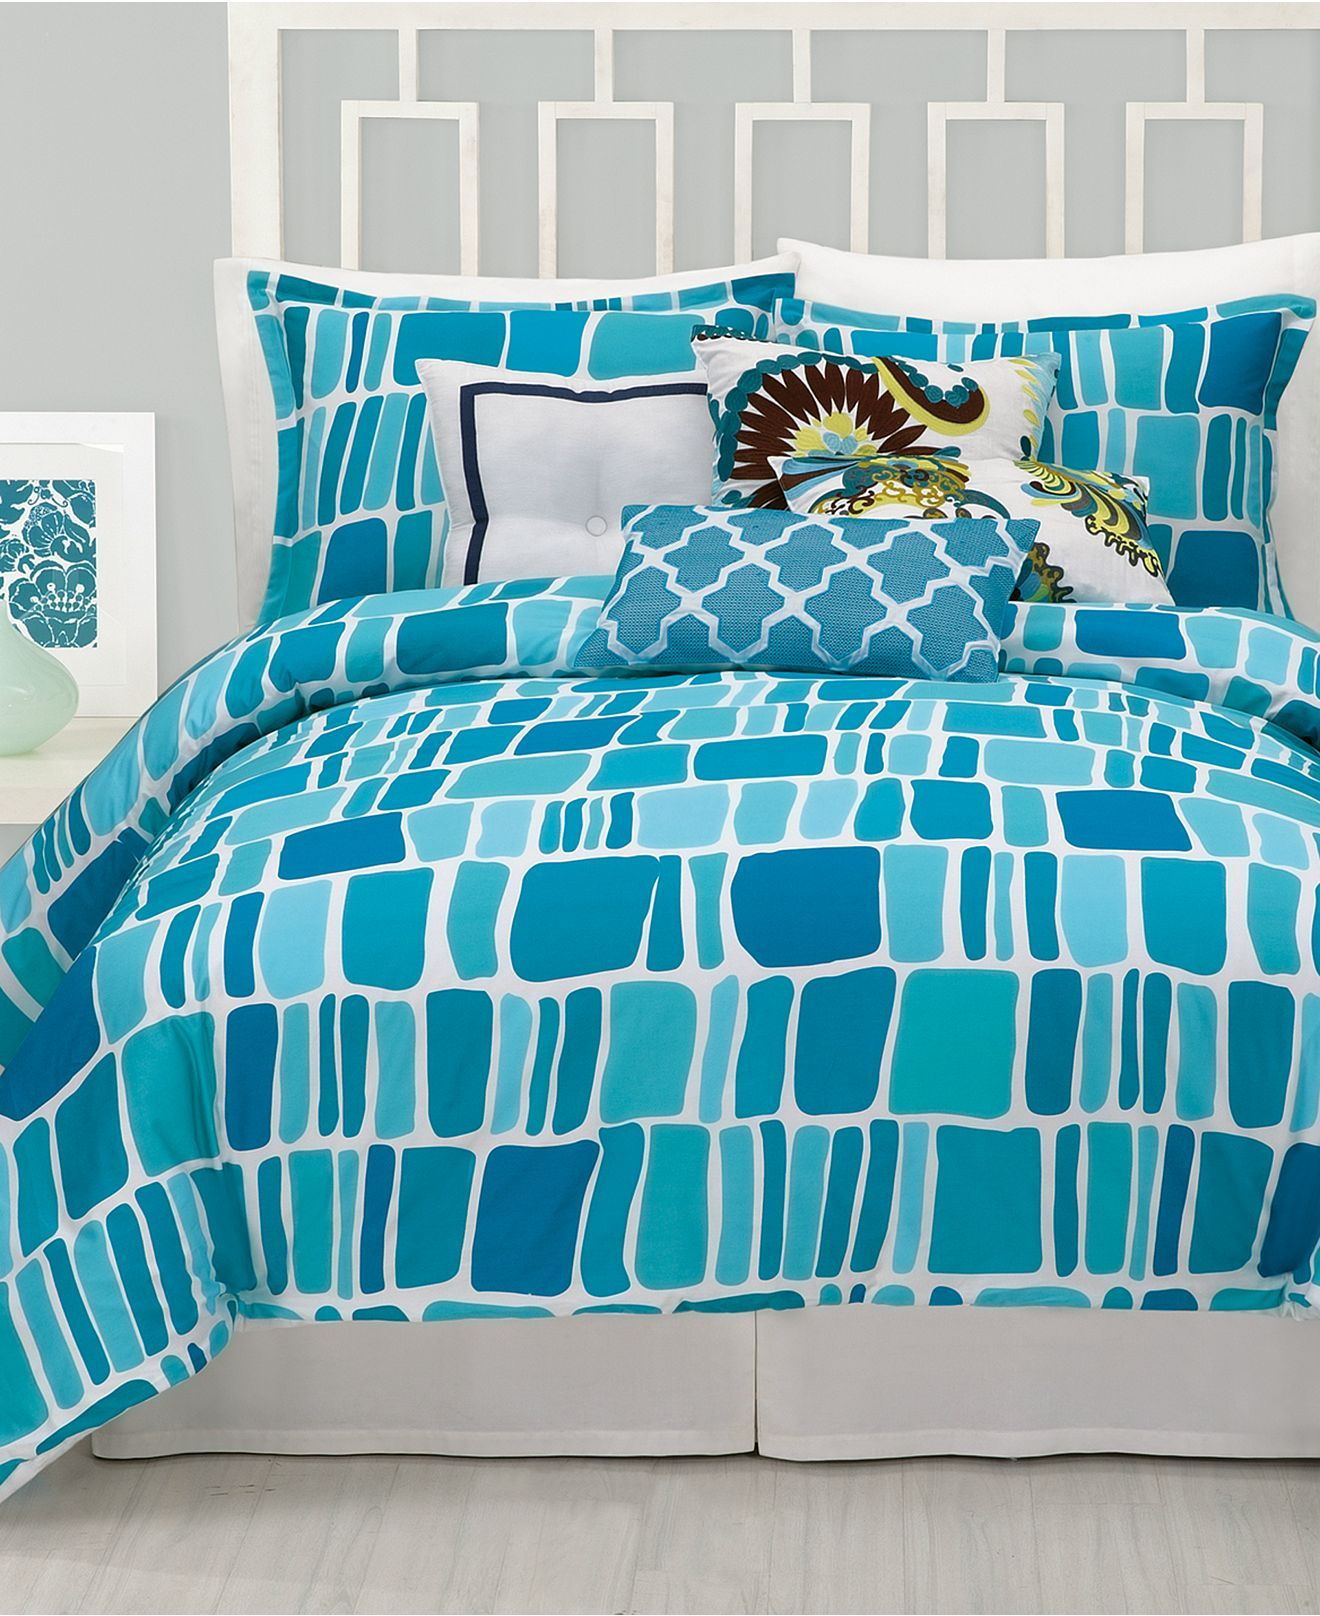 Trina Turk Bedding Stones Comforter And Duvet Cover Sets